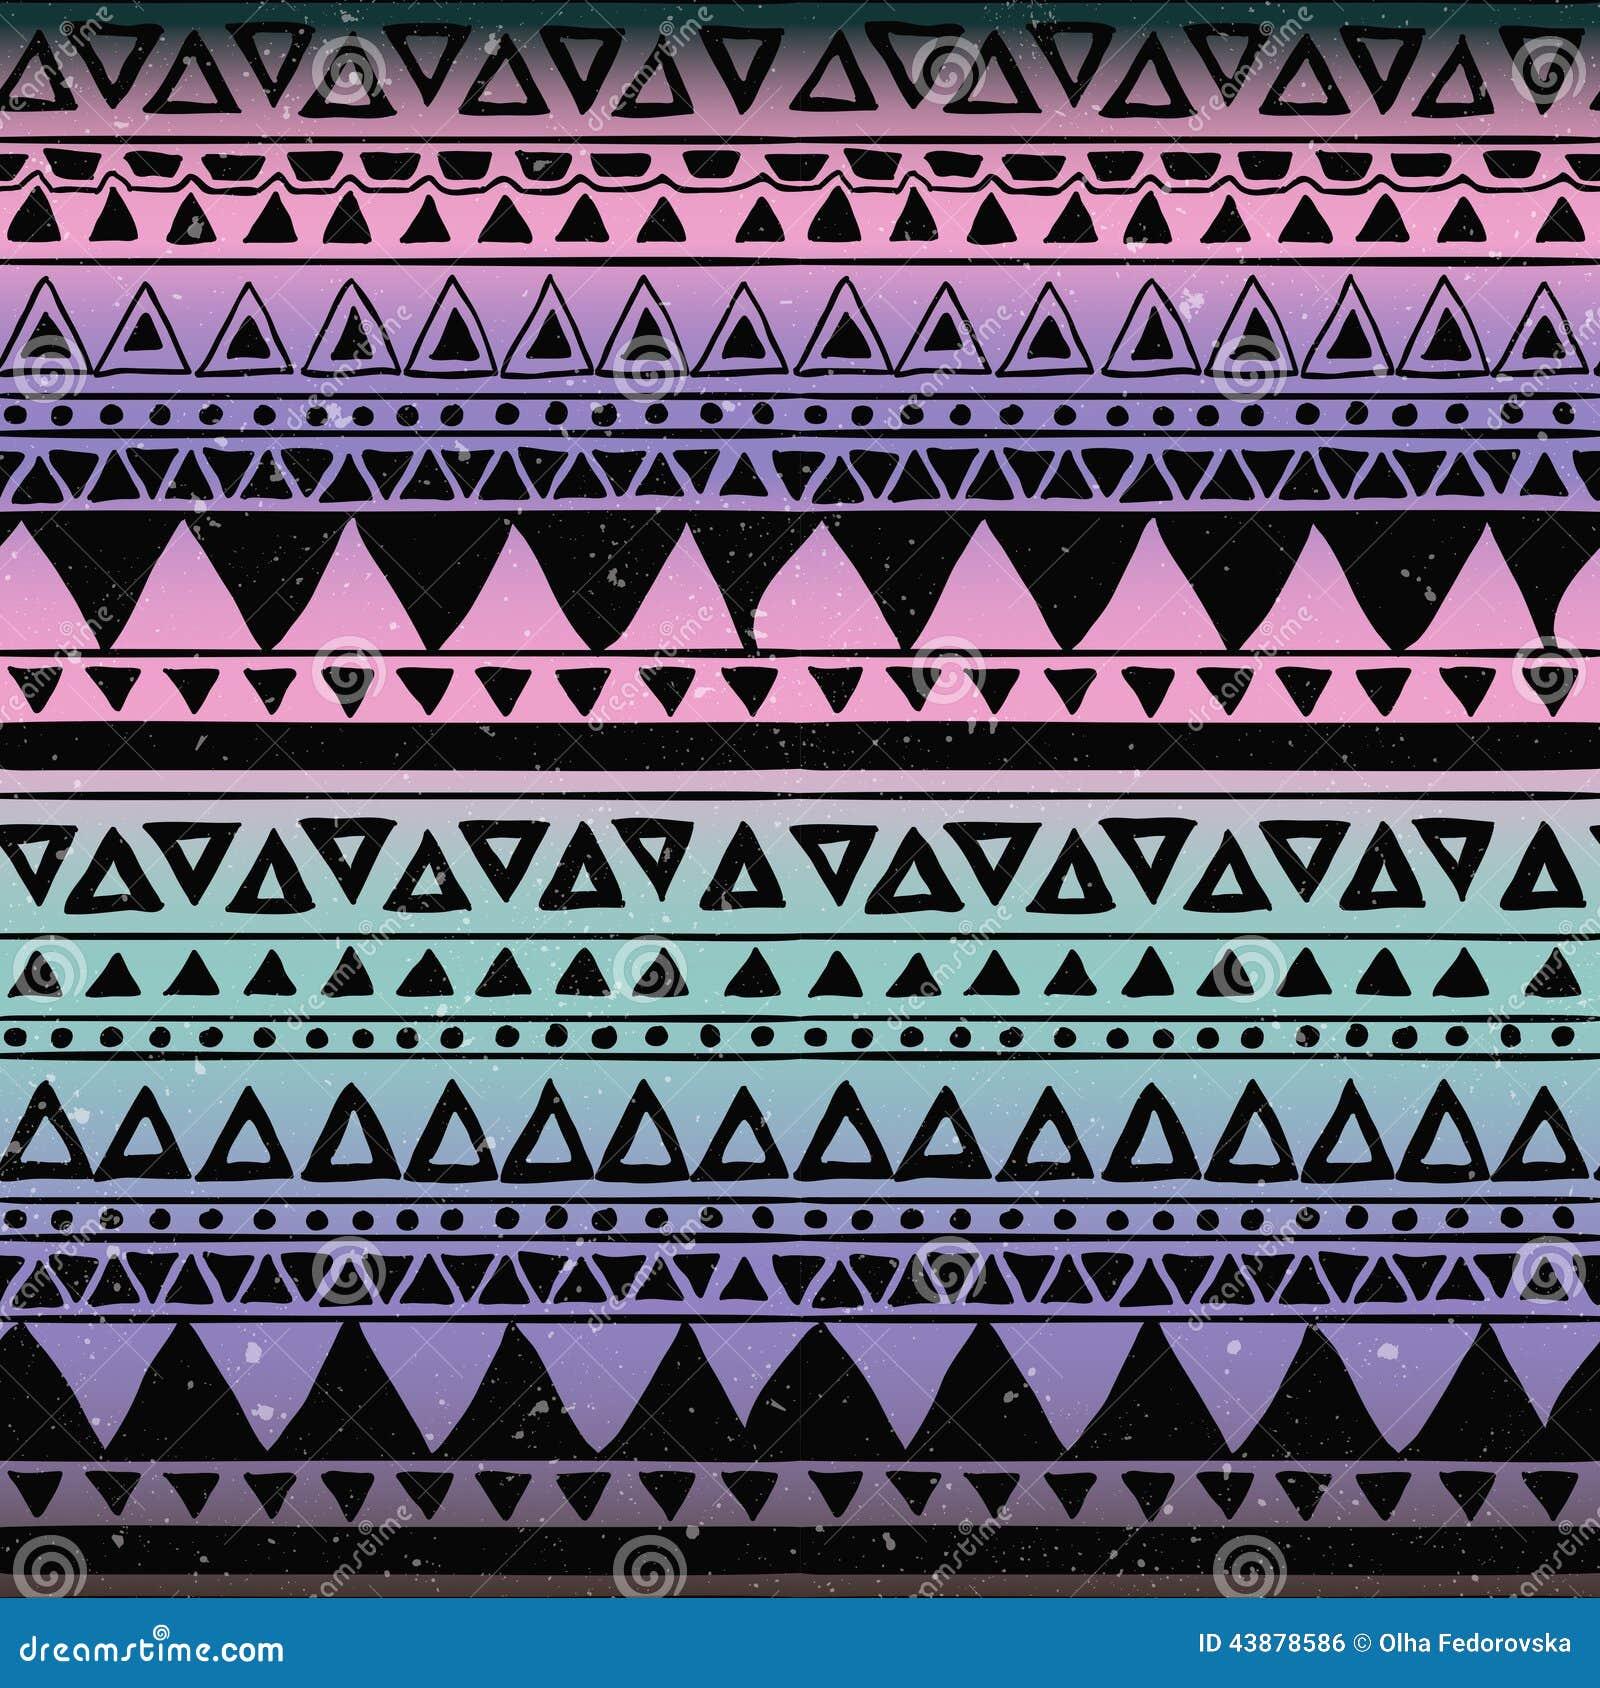 Aztec Tribal Patterns Easy